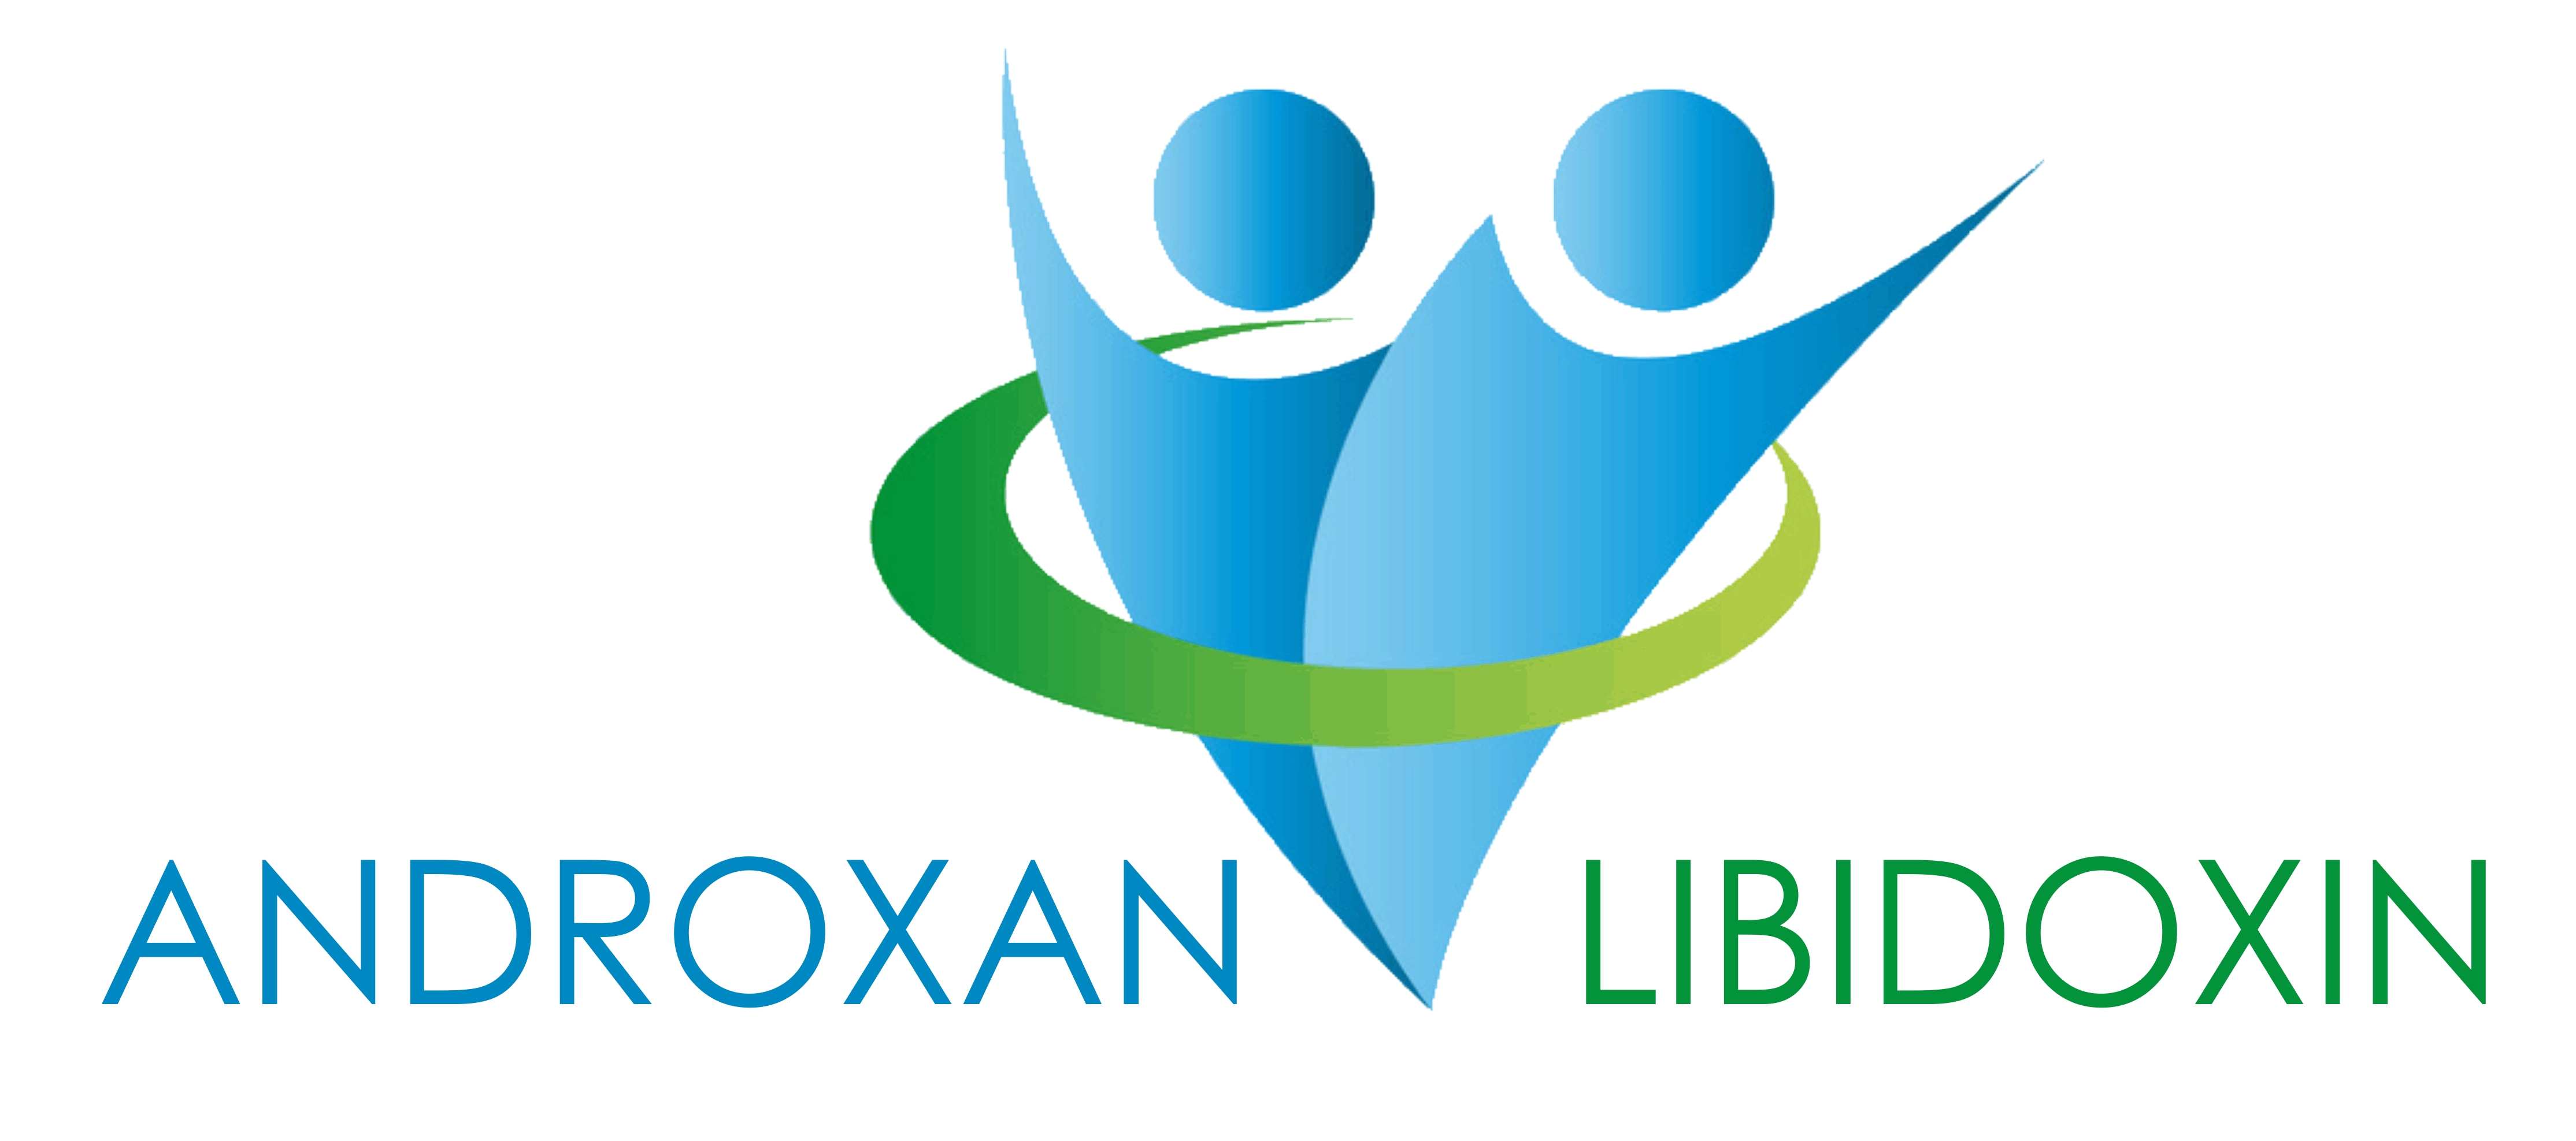 Androxan-Libidoxin